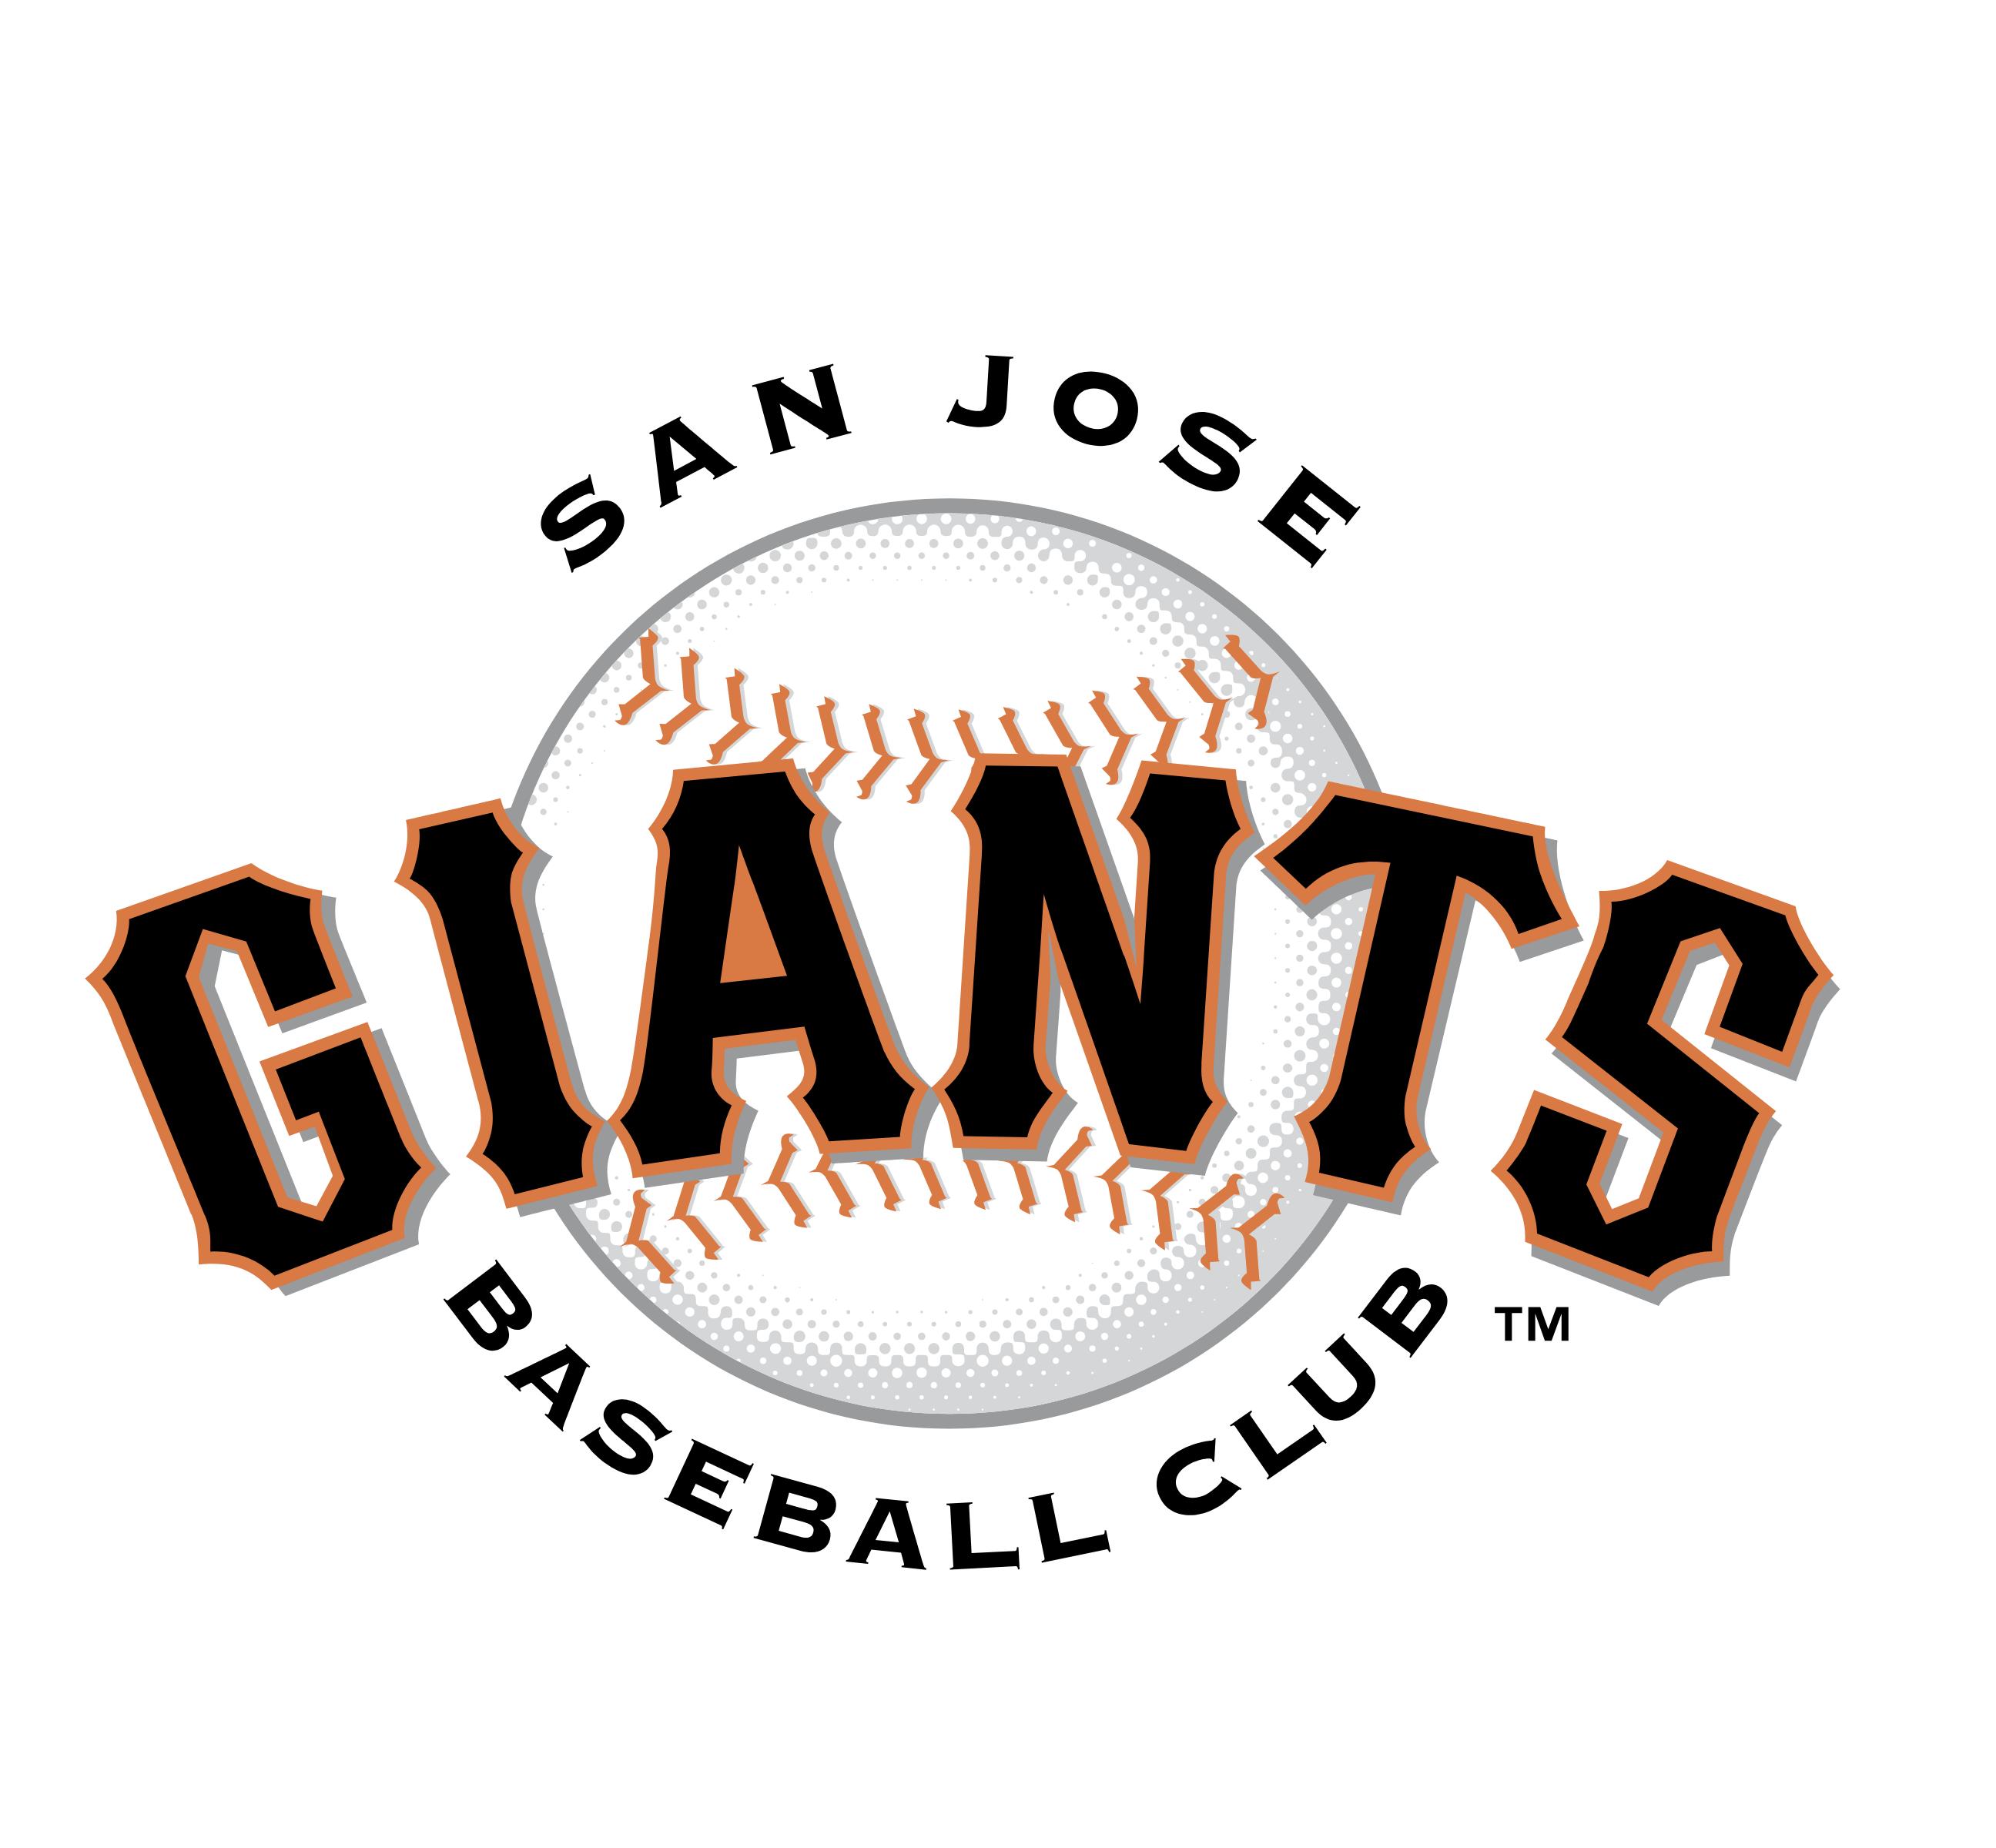 San Jose Giants